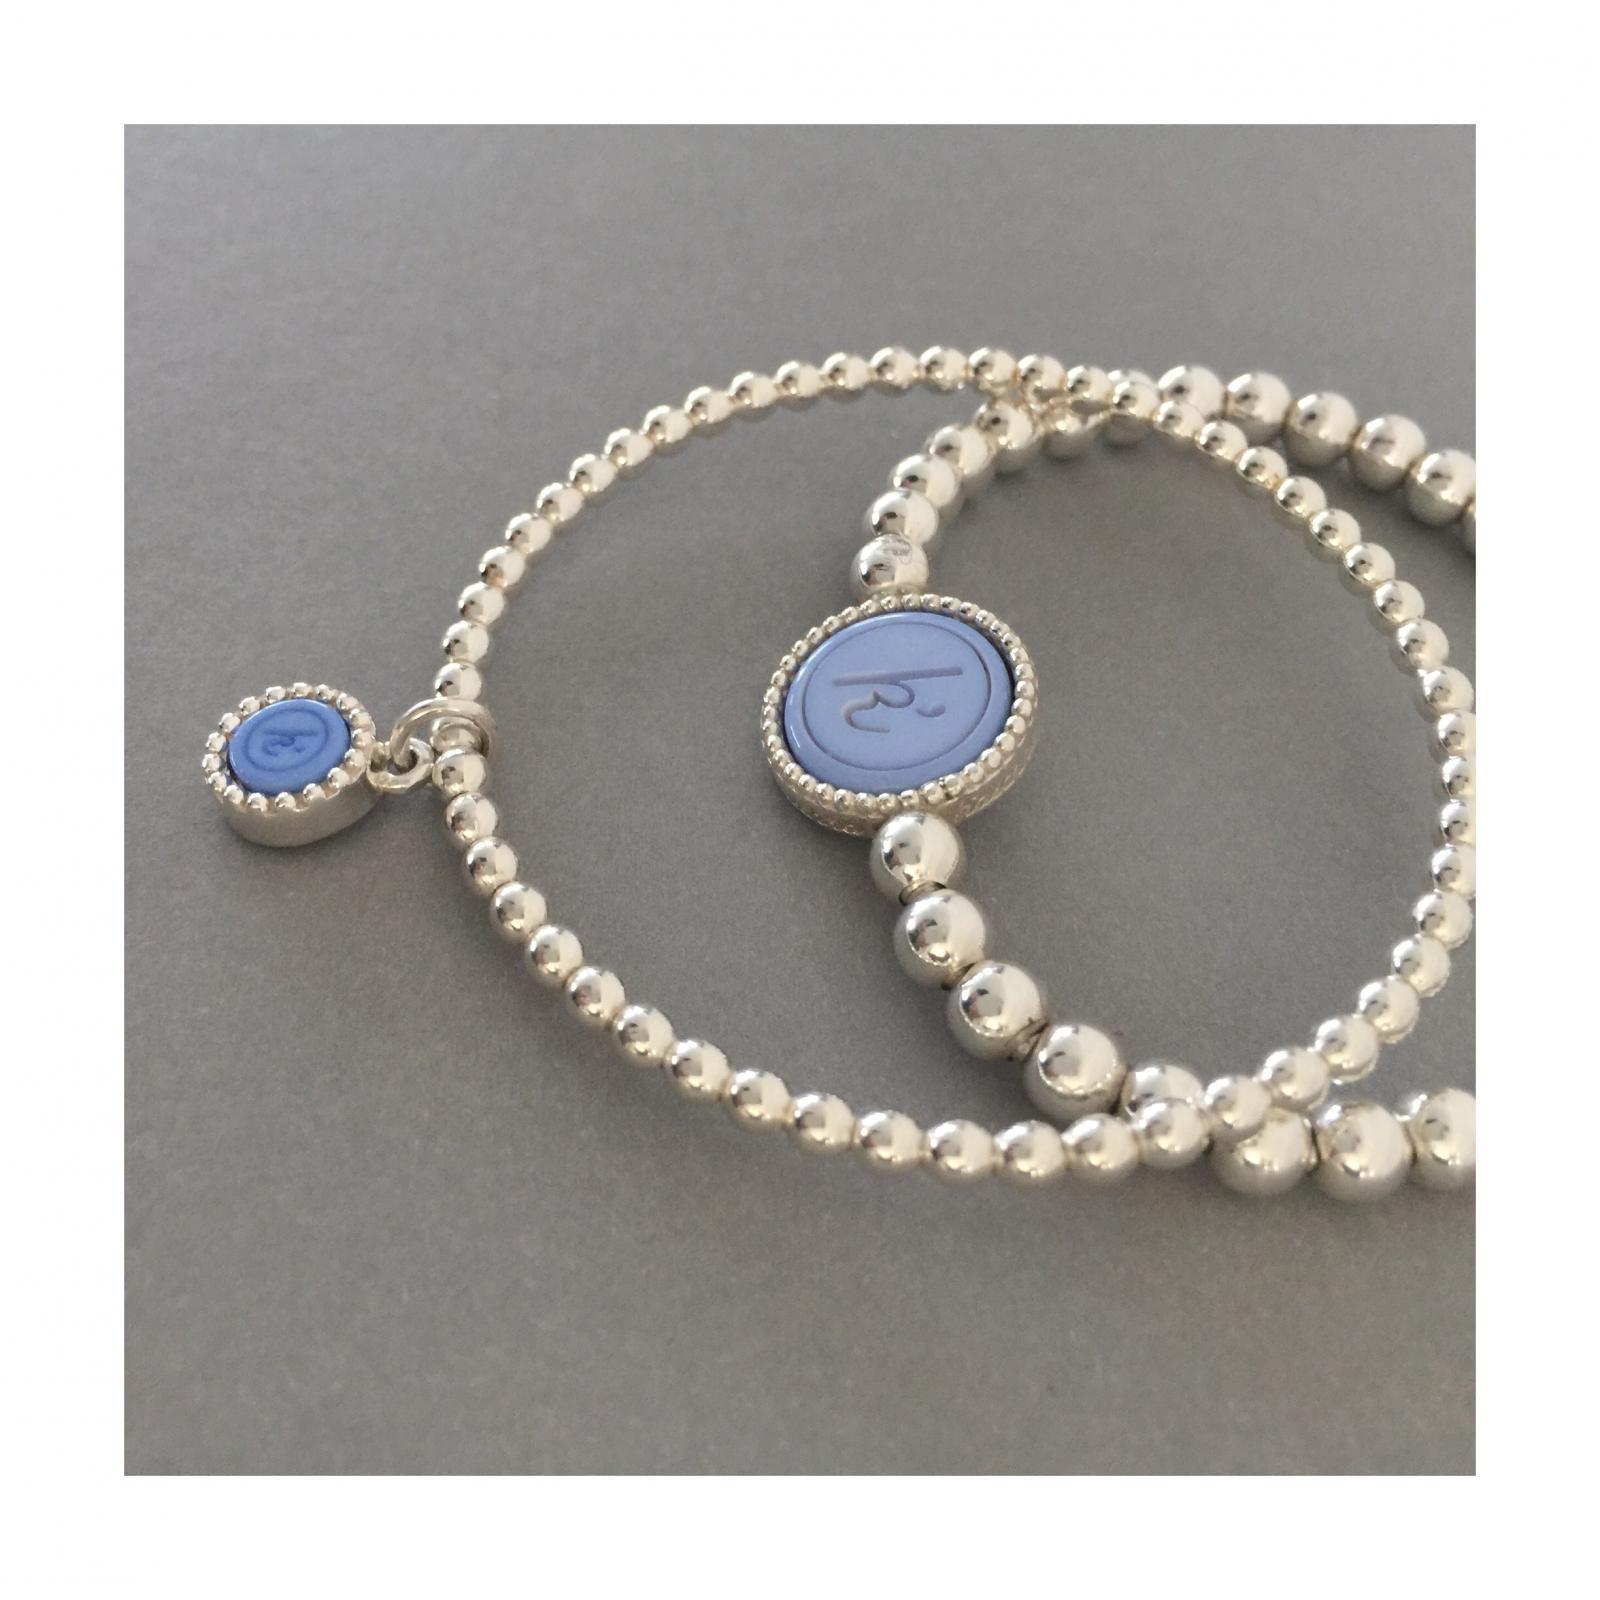 Flexibele 925 sterling zilveren wisselbare armband. Flexibele 925 sterling zilveren armband met kasminis hange